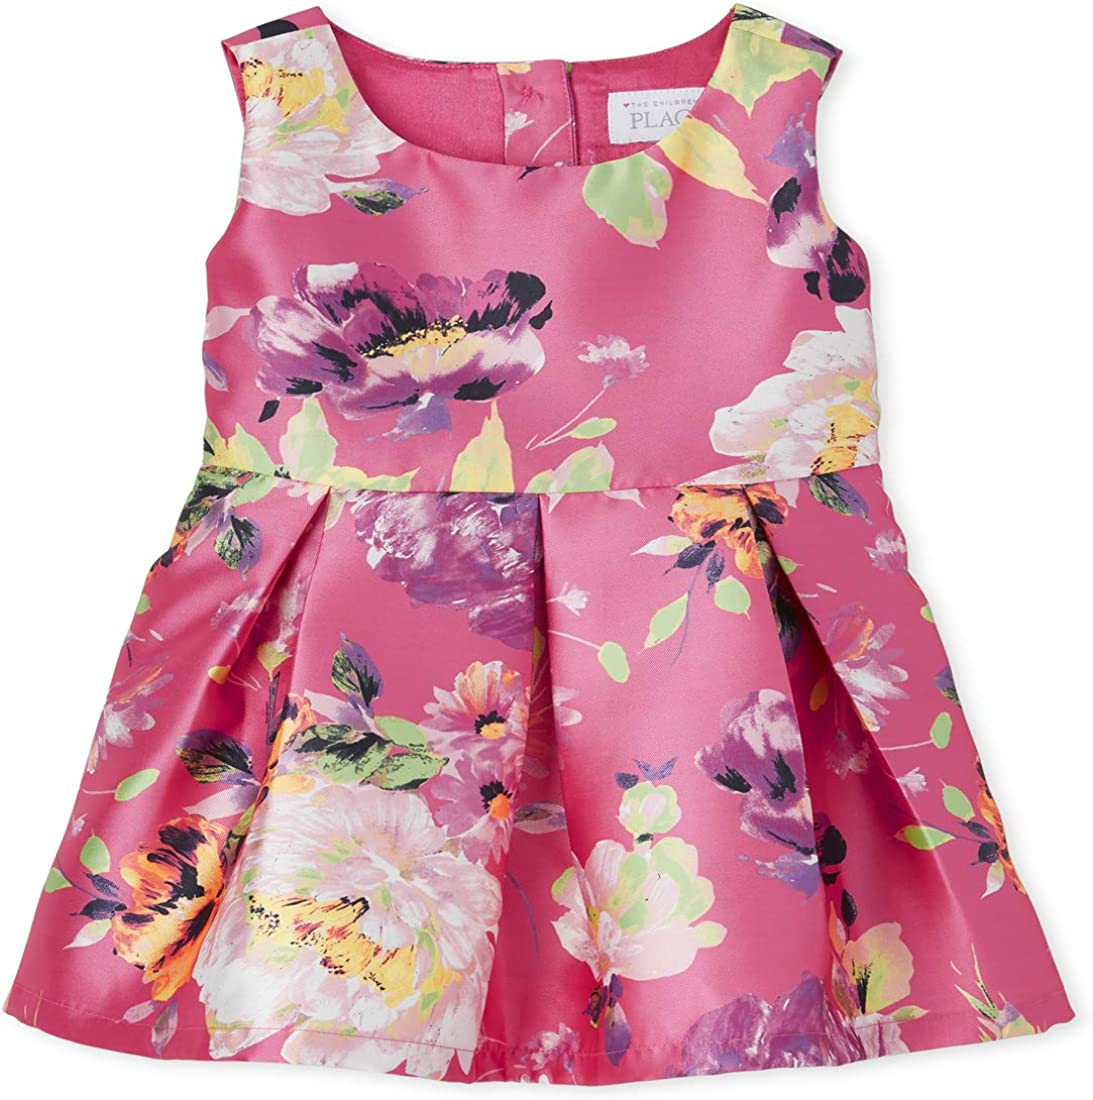 The Children's Place Girls' Short Sleeve Floral Print Dress